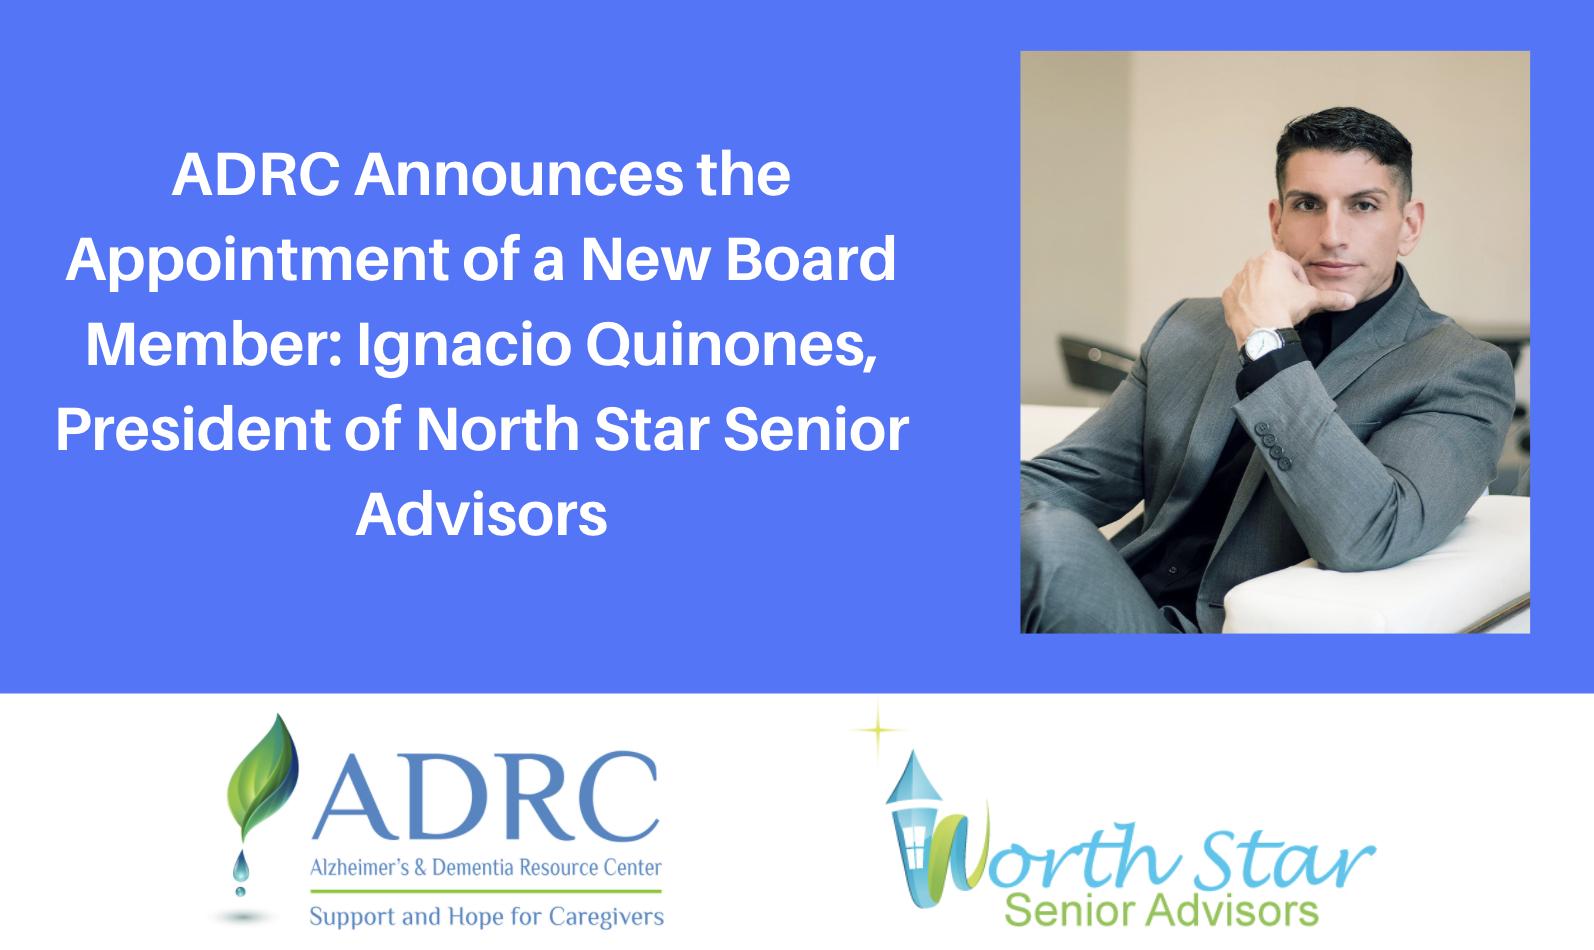 Ignacio-quinones-adrc-new-board-member